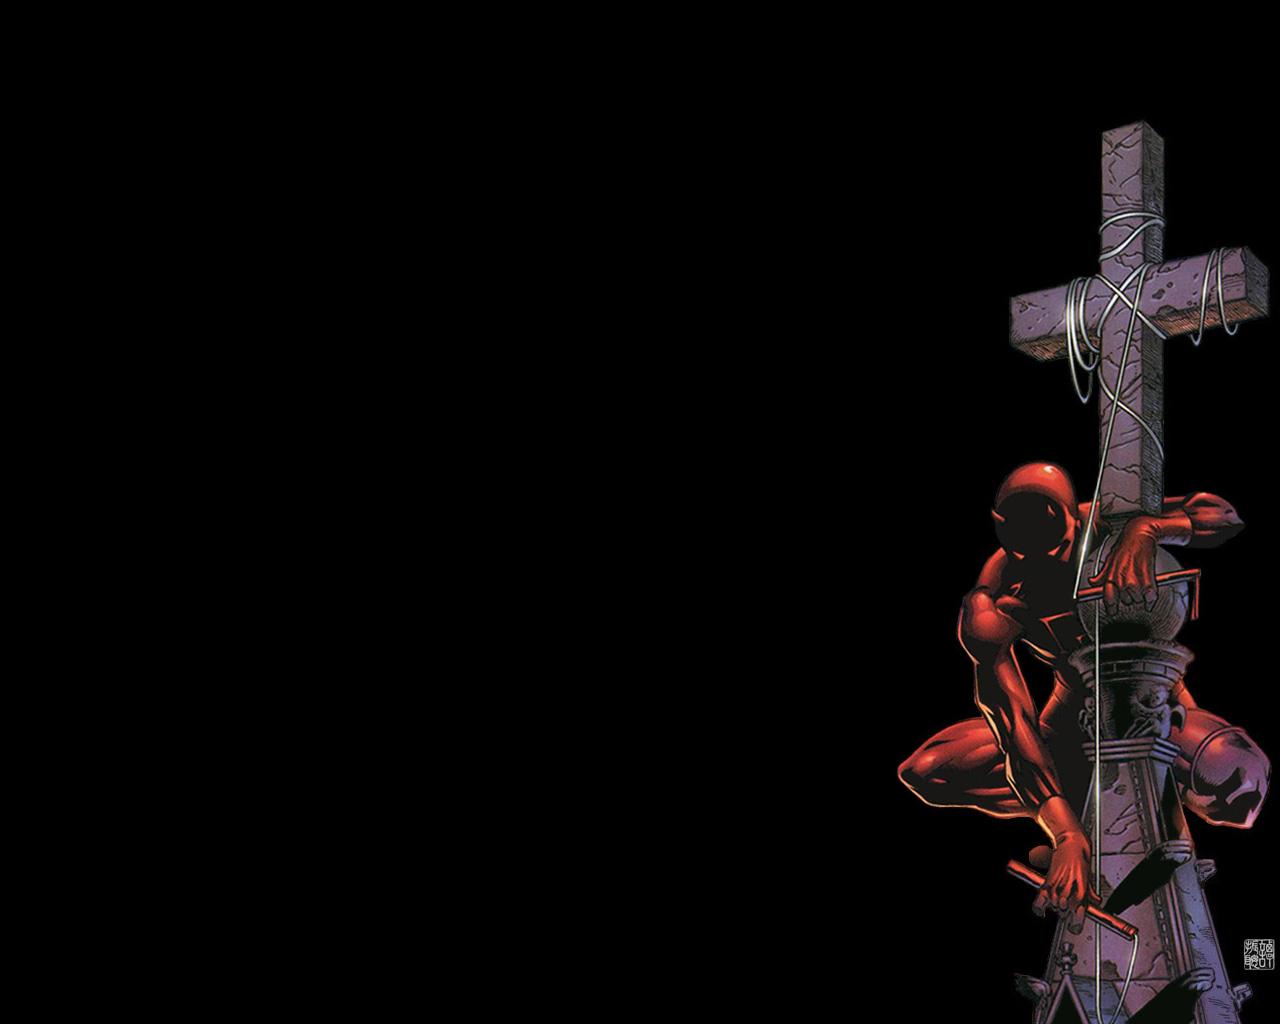 Daredevil Wallpaper Picserio Daredevil Wallpaper On Cross 2573331 Hd Wallpaper Backgrounds Download